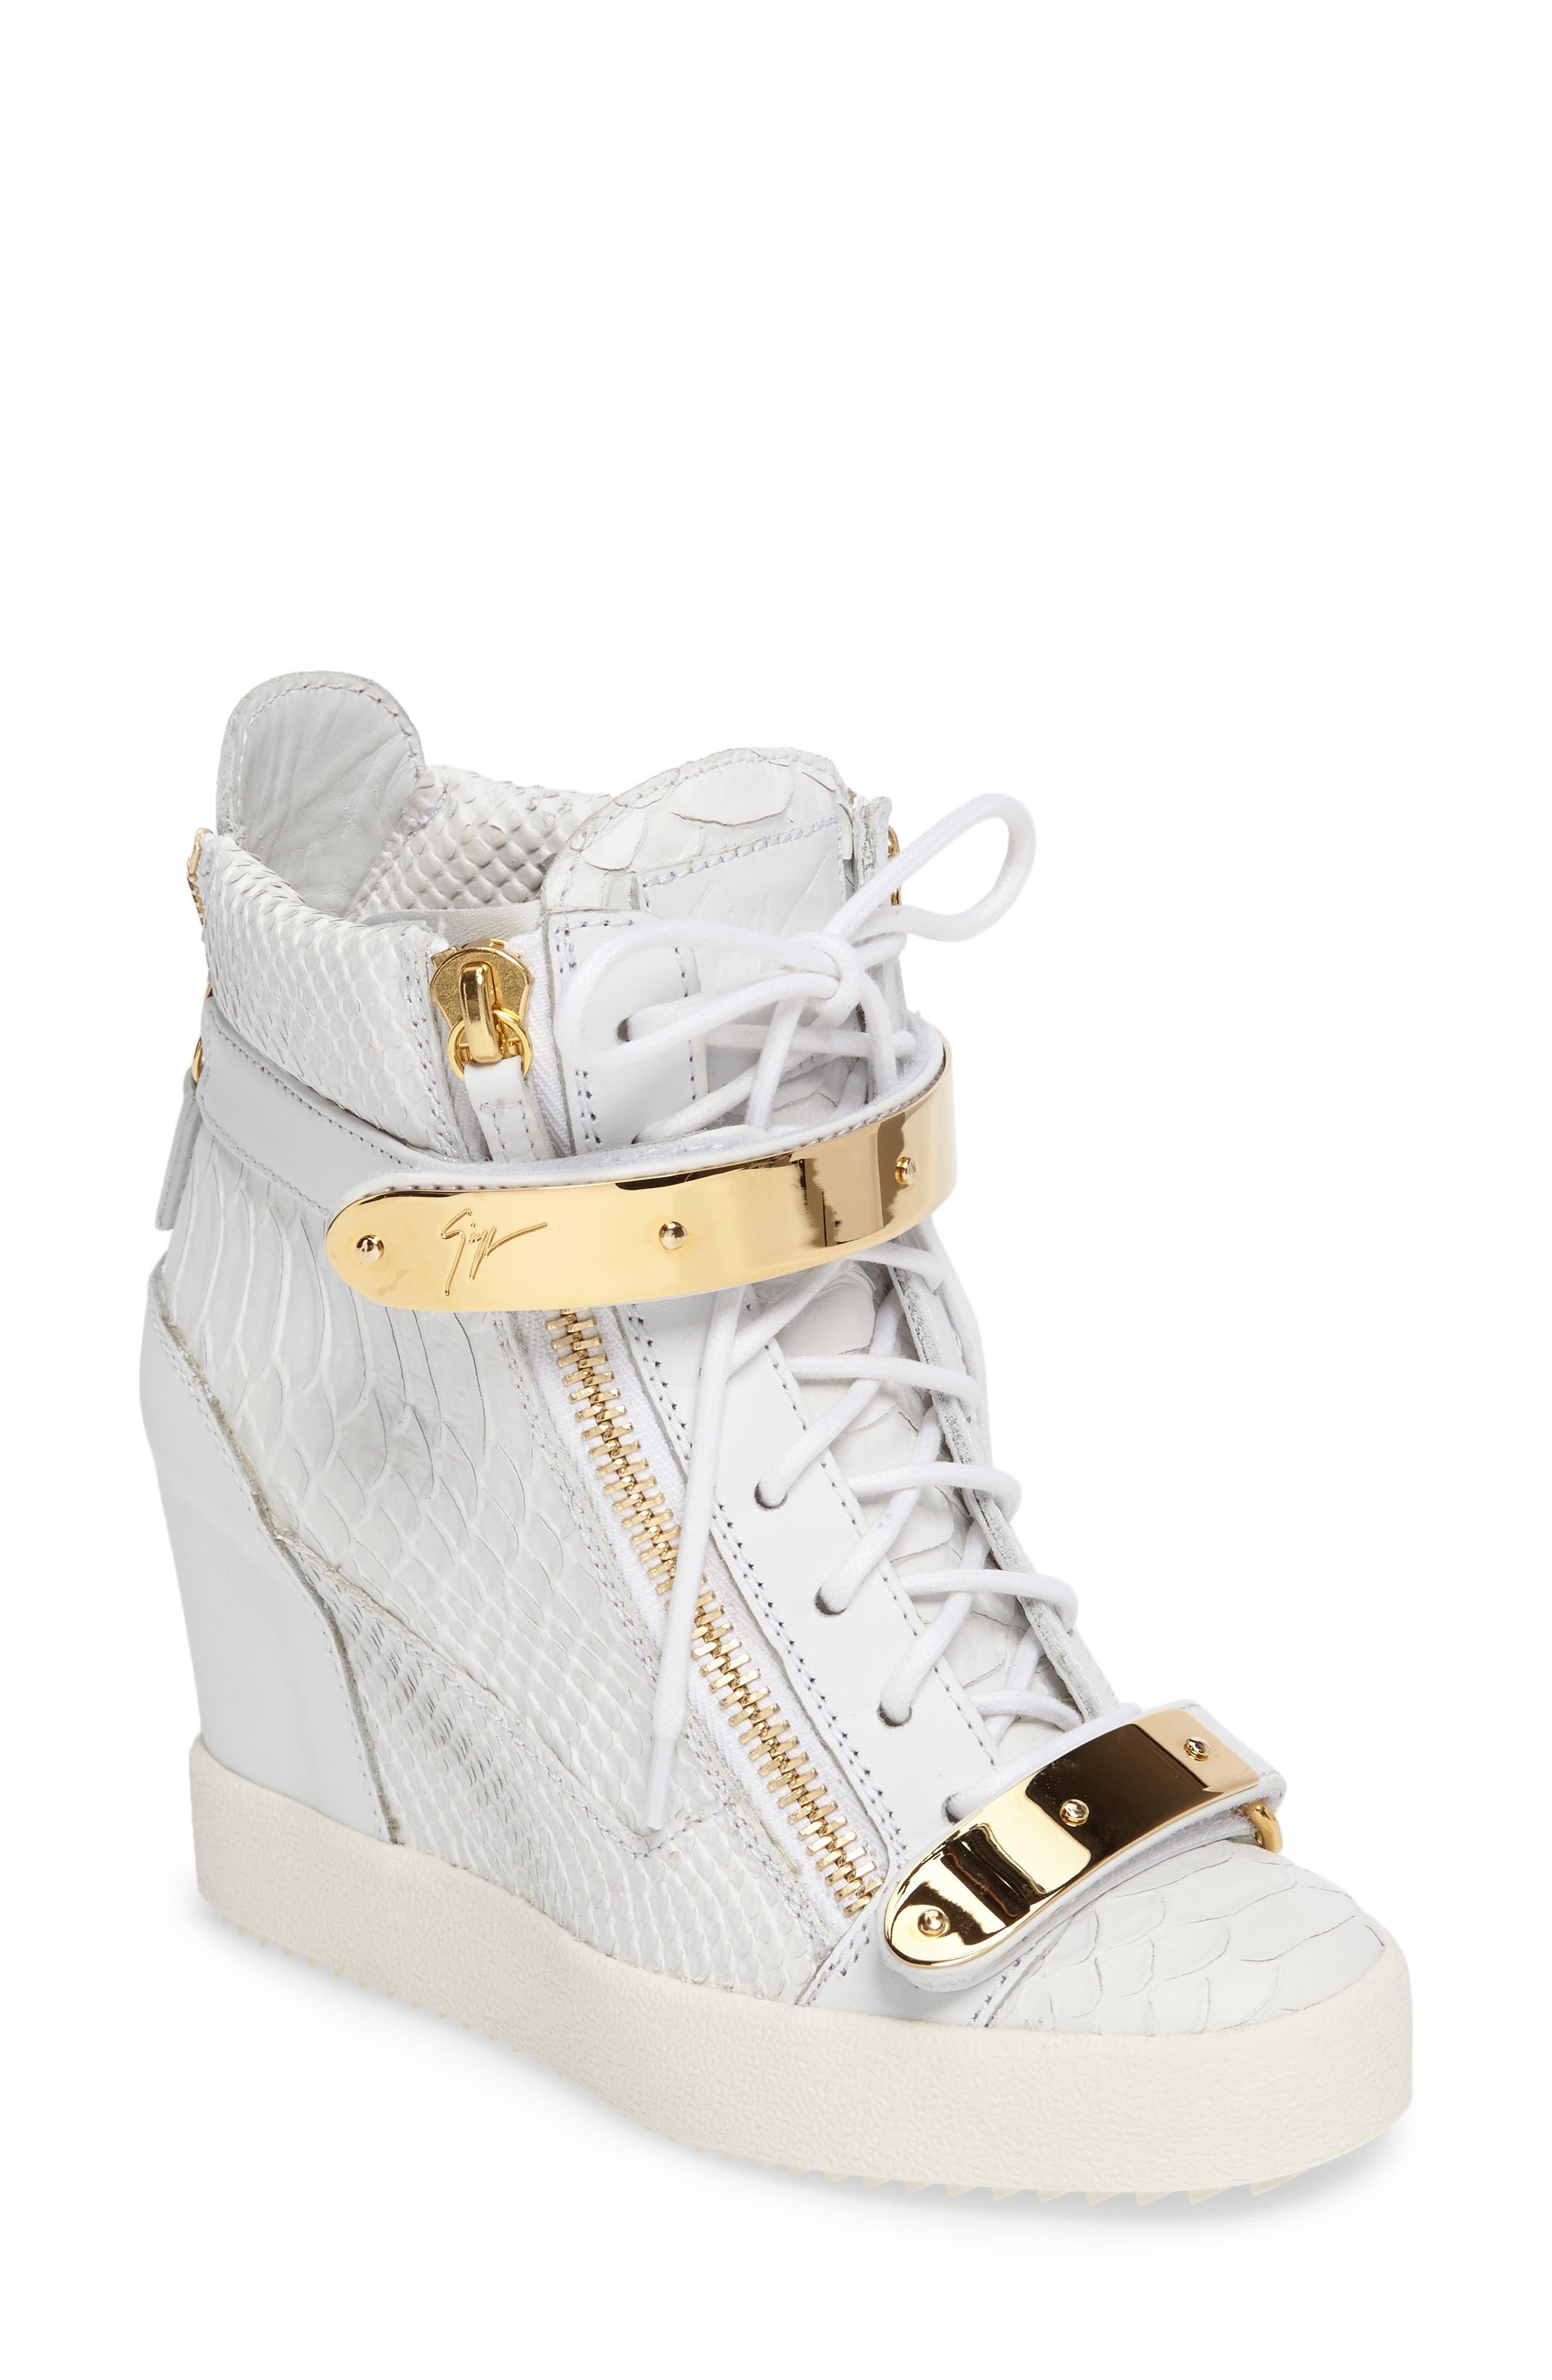 Main Image - Giuseppe Zanotti Wedge Sneaker (Women)